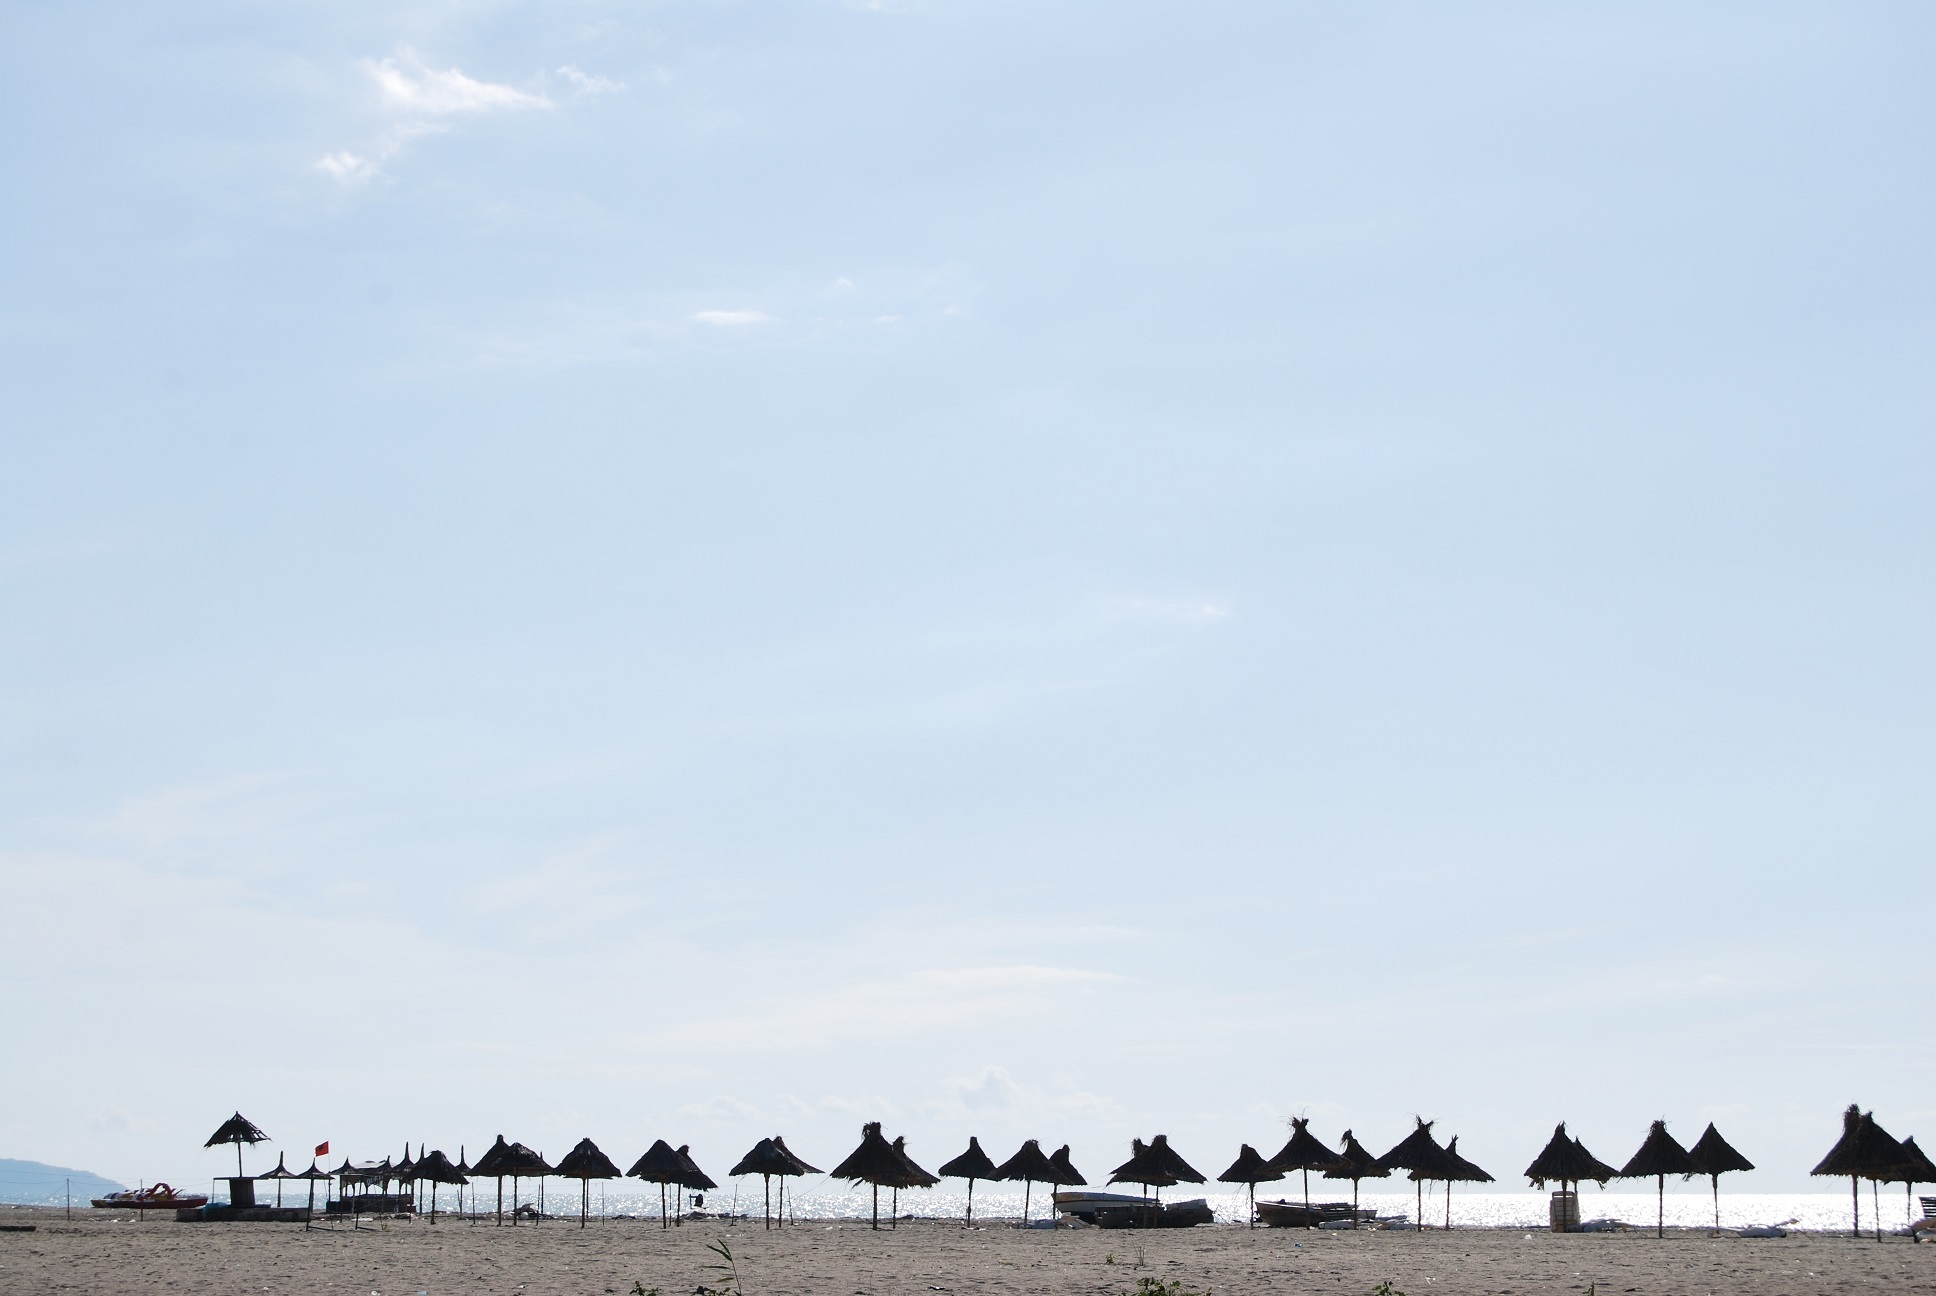 voyage road trip : une plage en Albanie